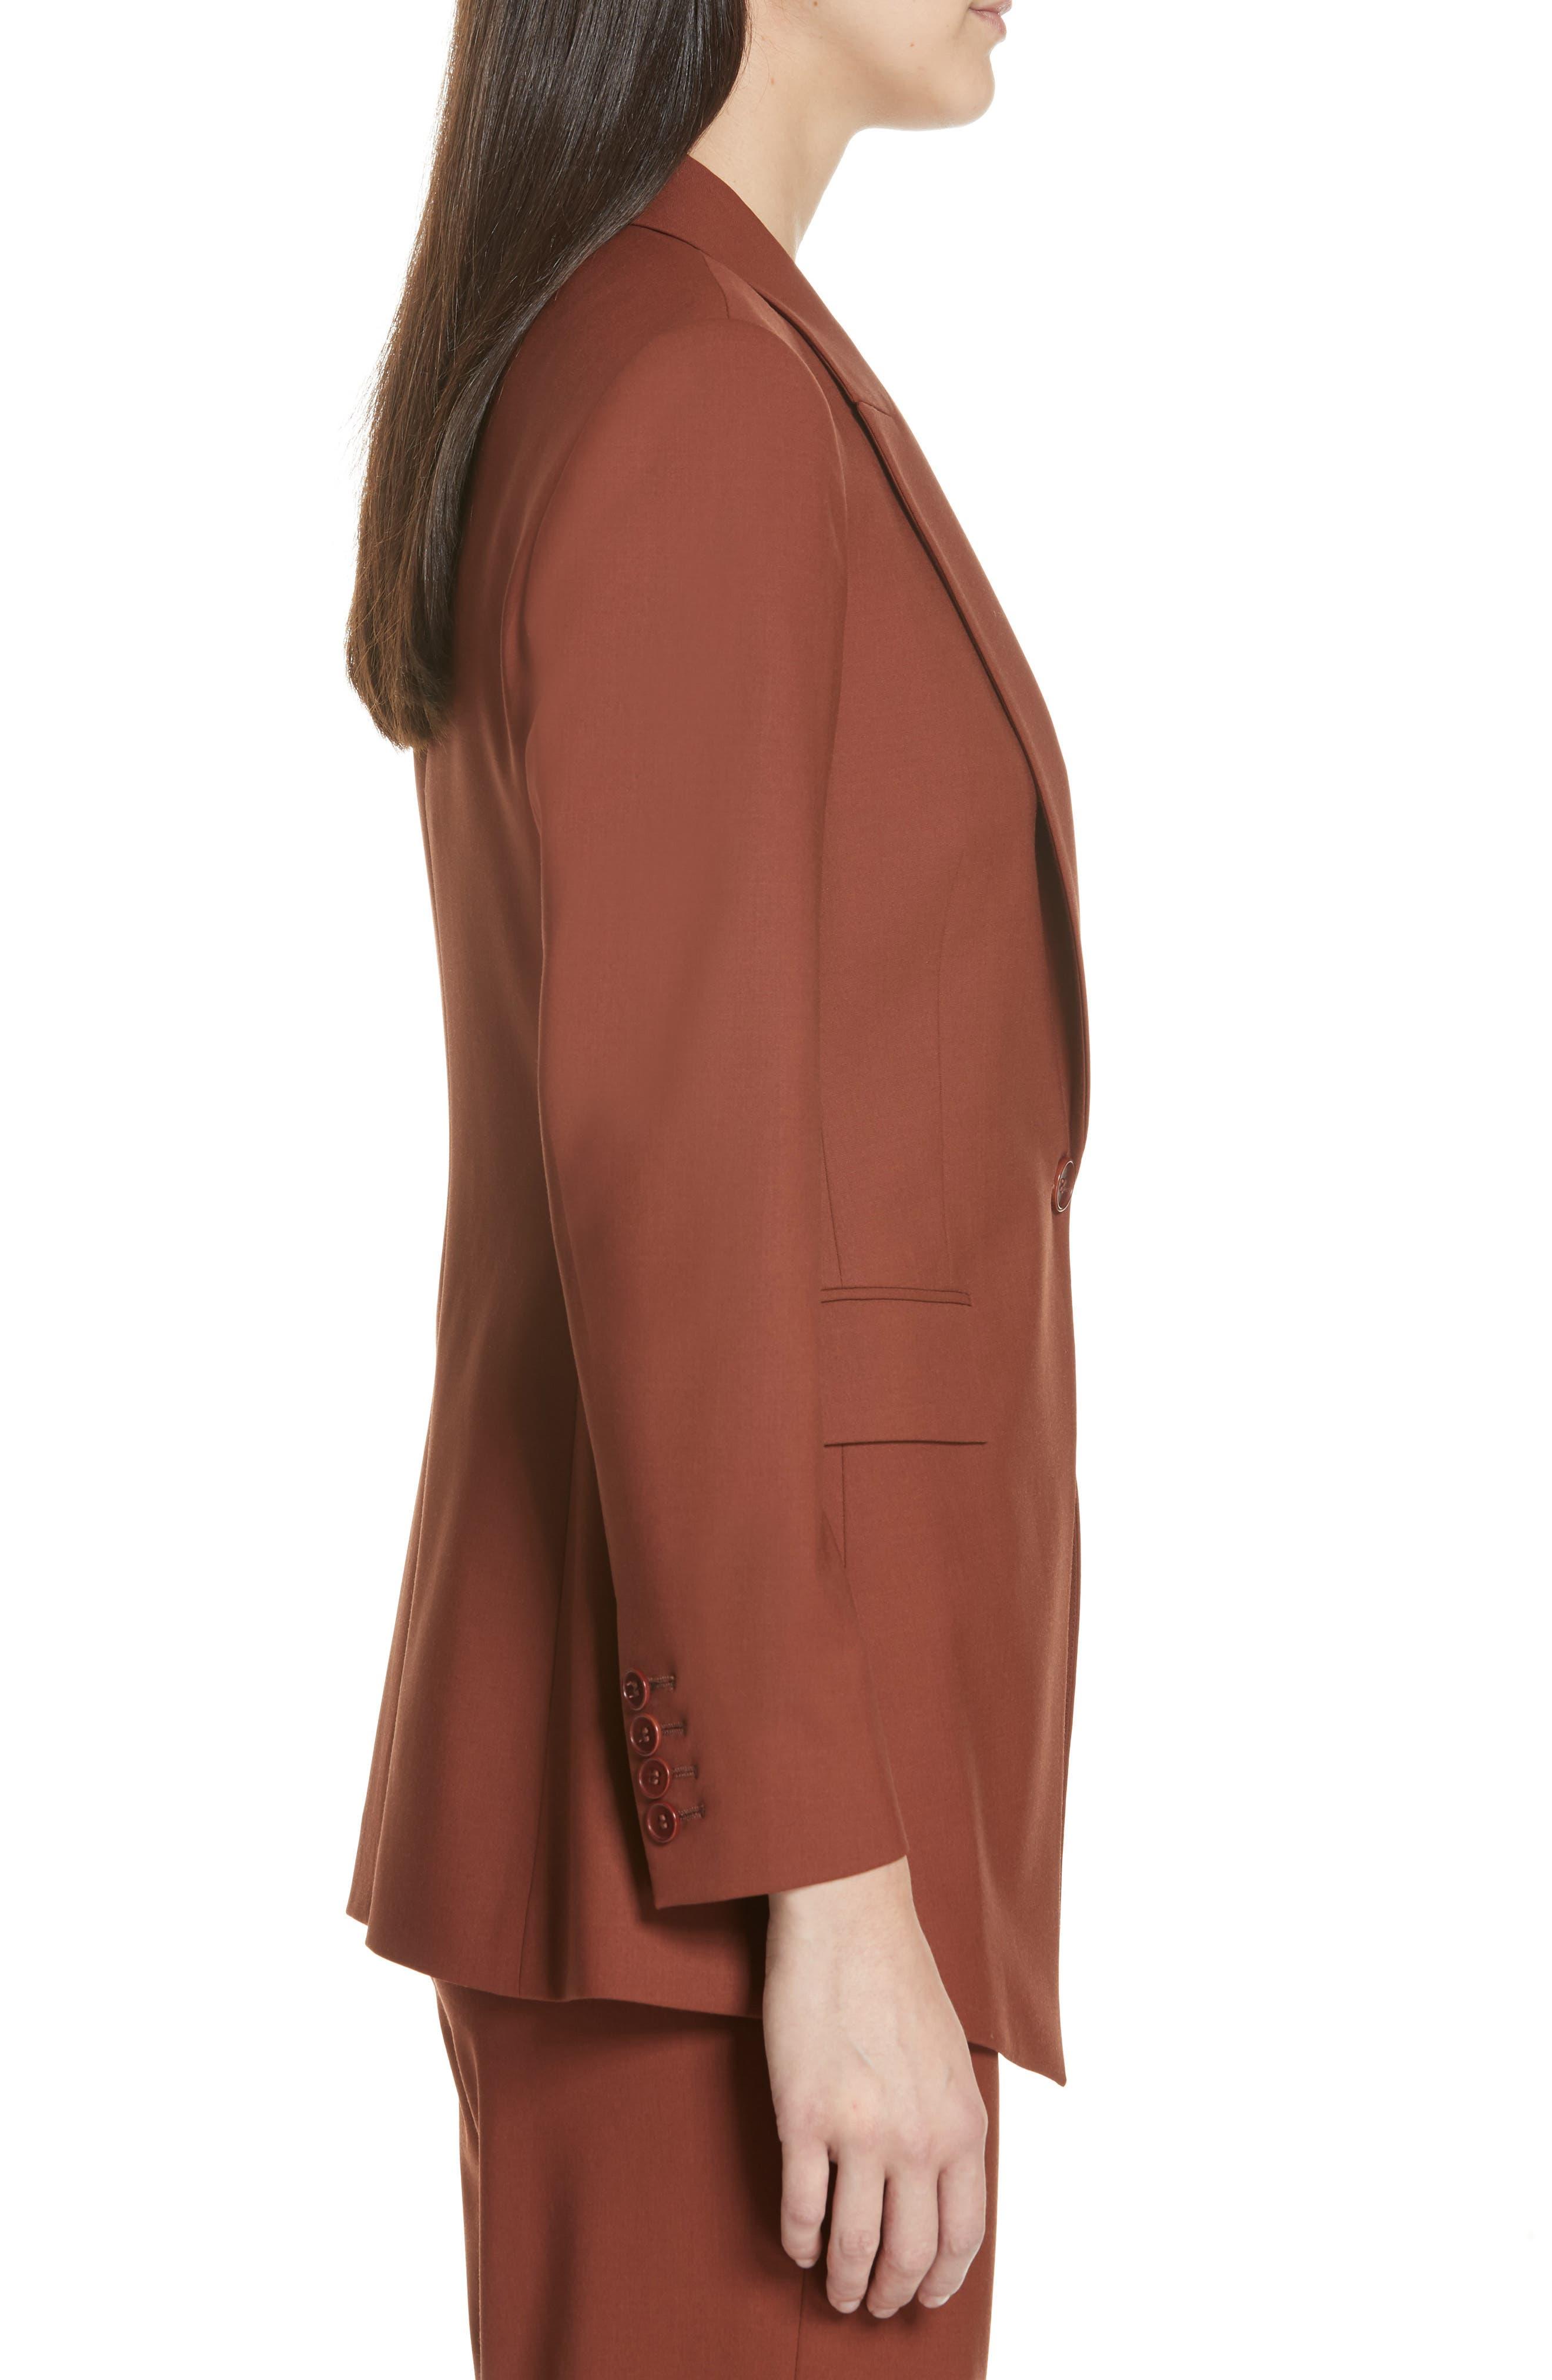 Etienette B Good Wool Suit Jacket,                             Alternate thumbnail 23, color,